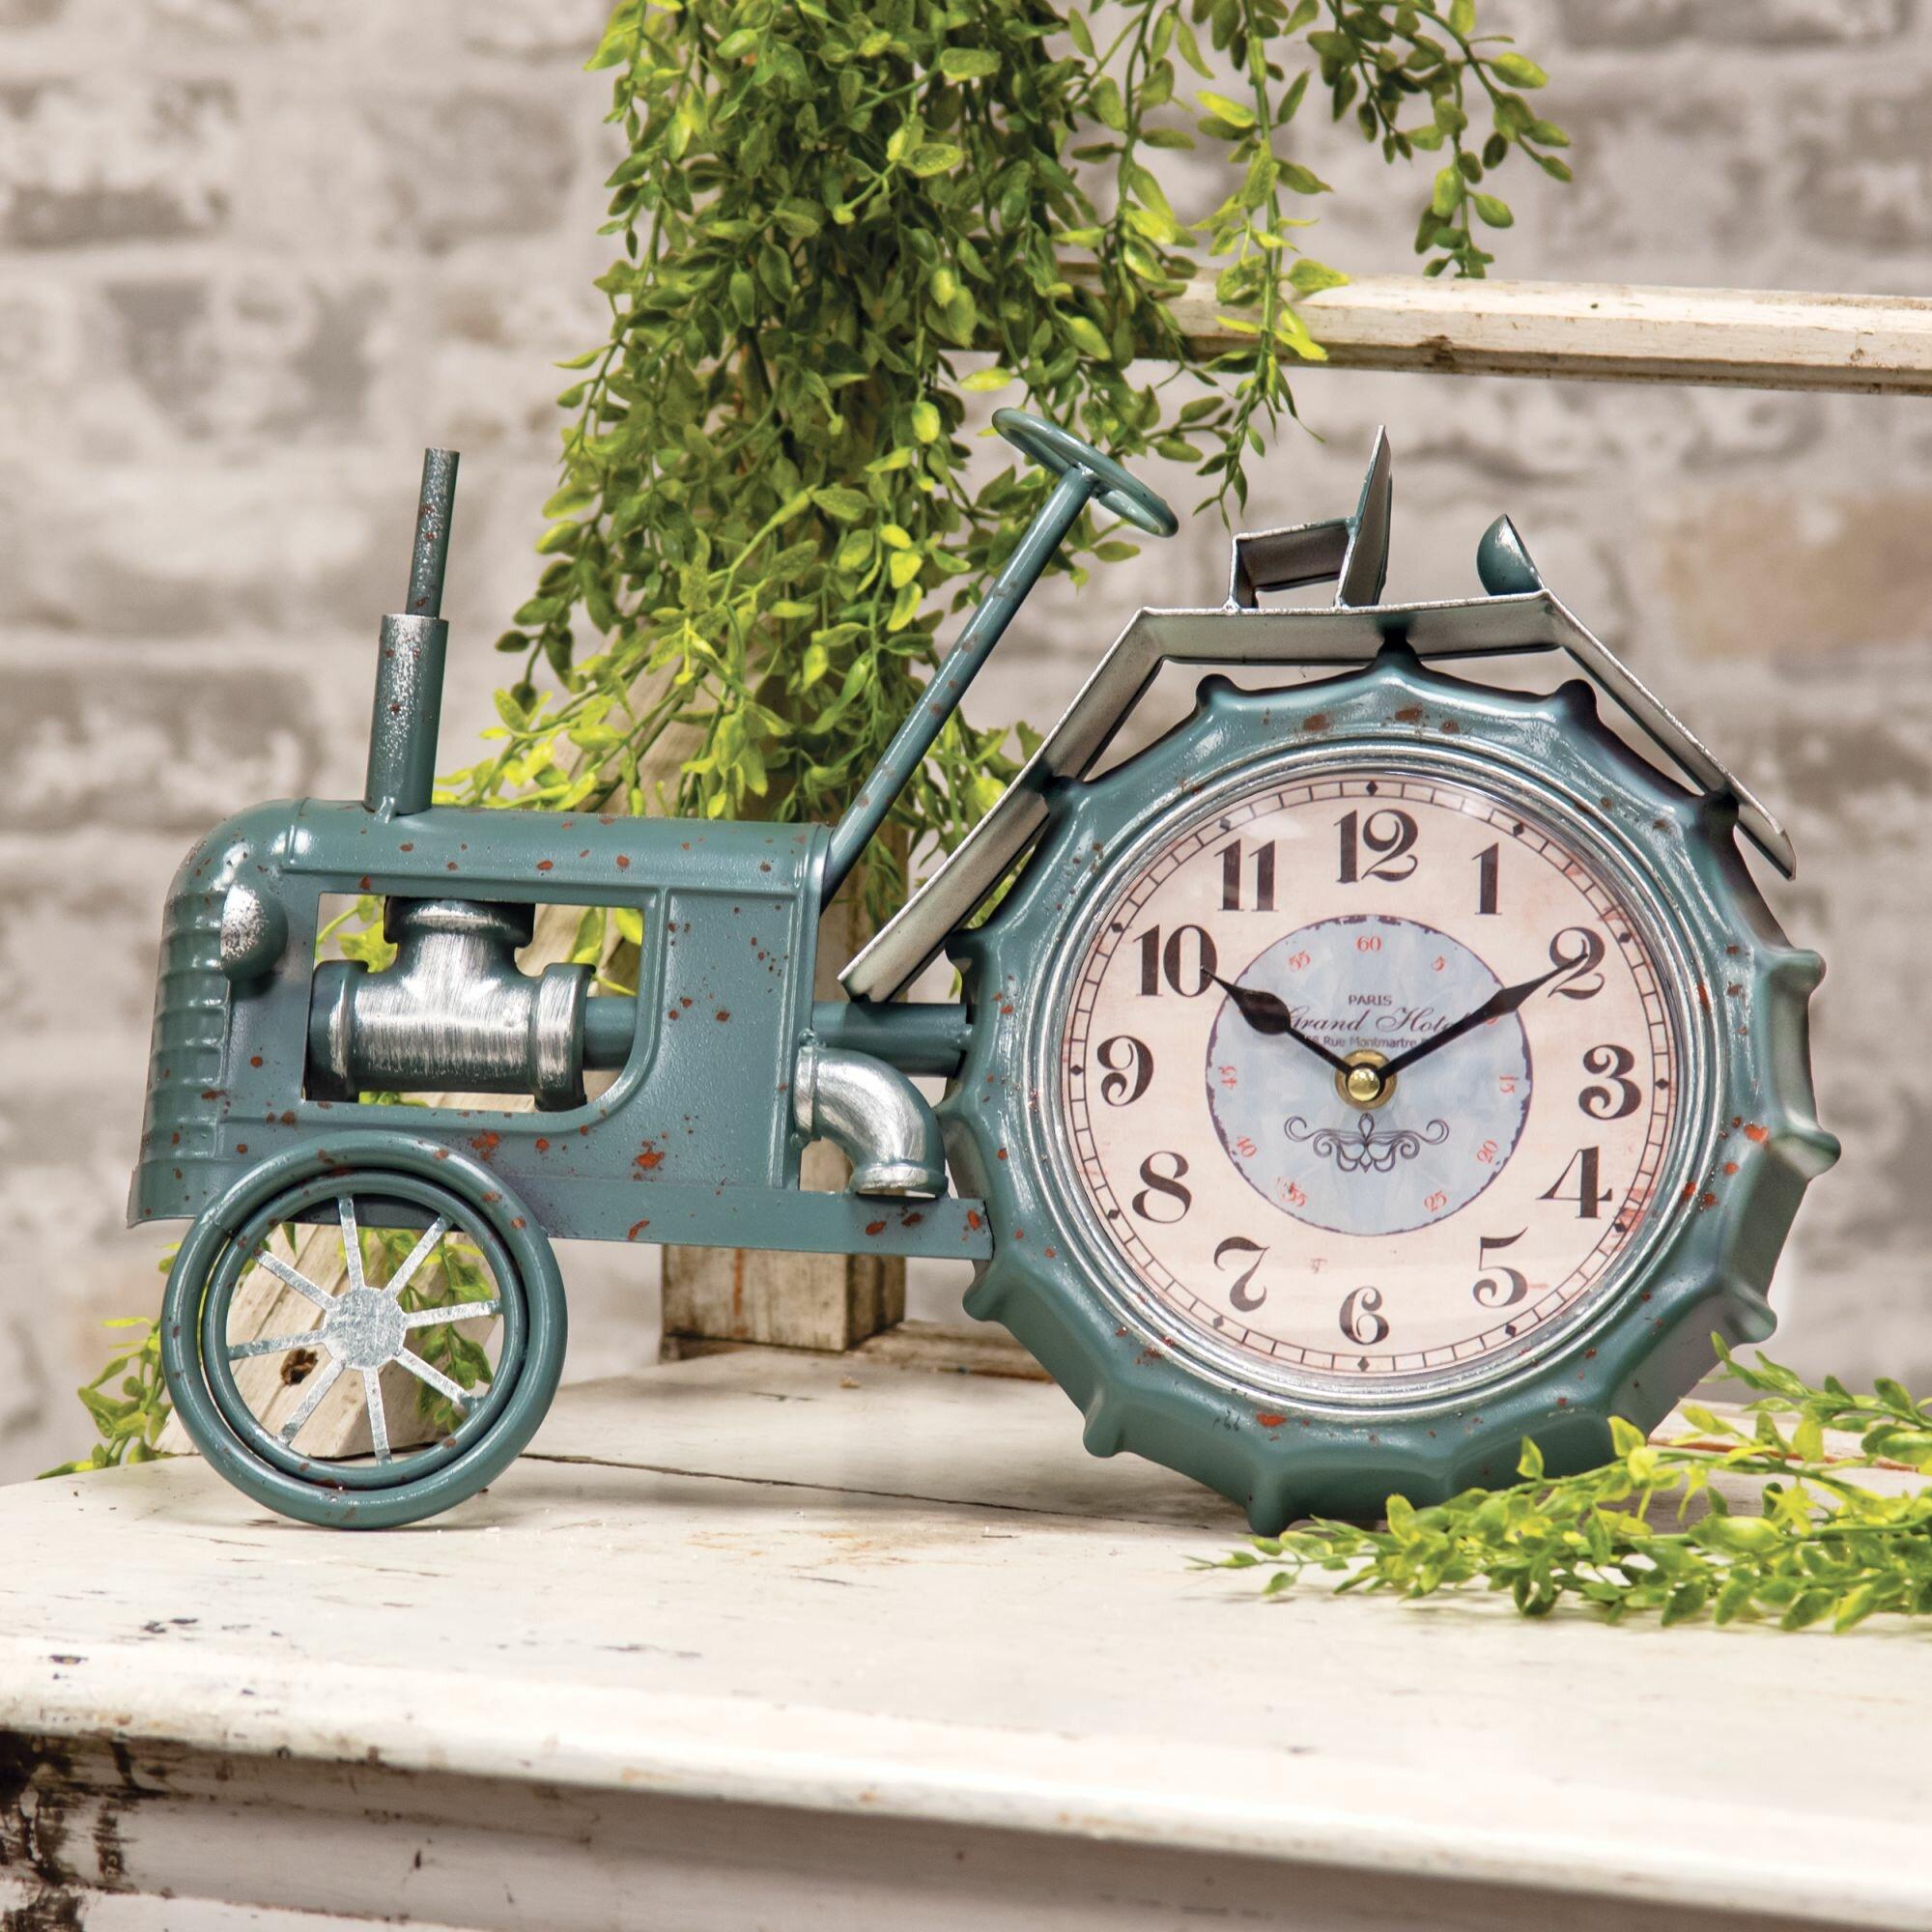 Unique Vintage-Look Old-Time Tractor Model Clock Desk Bookcase Nightstand Decor